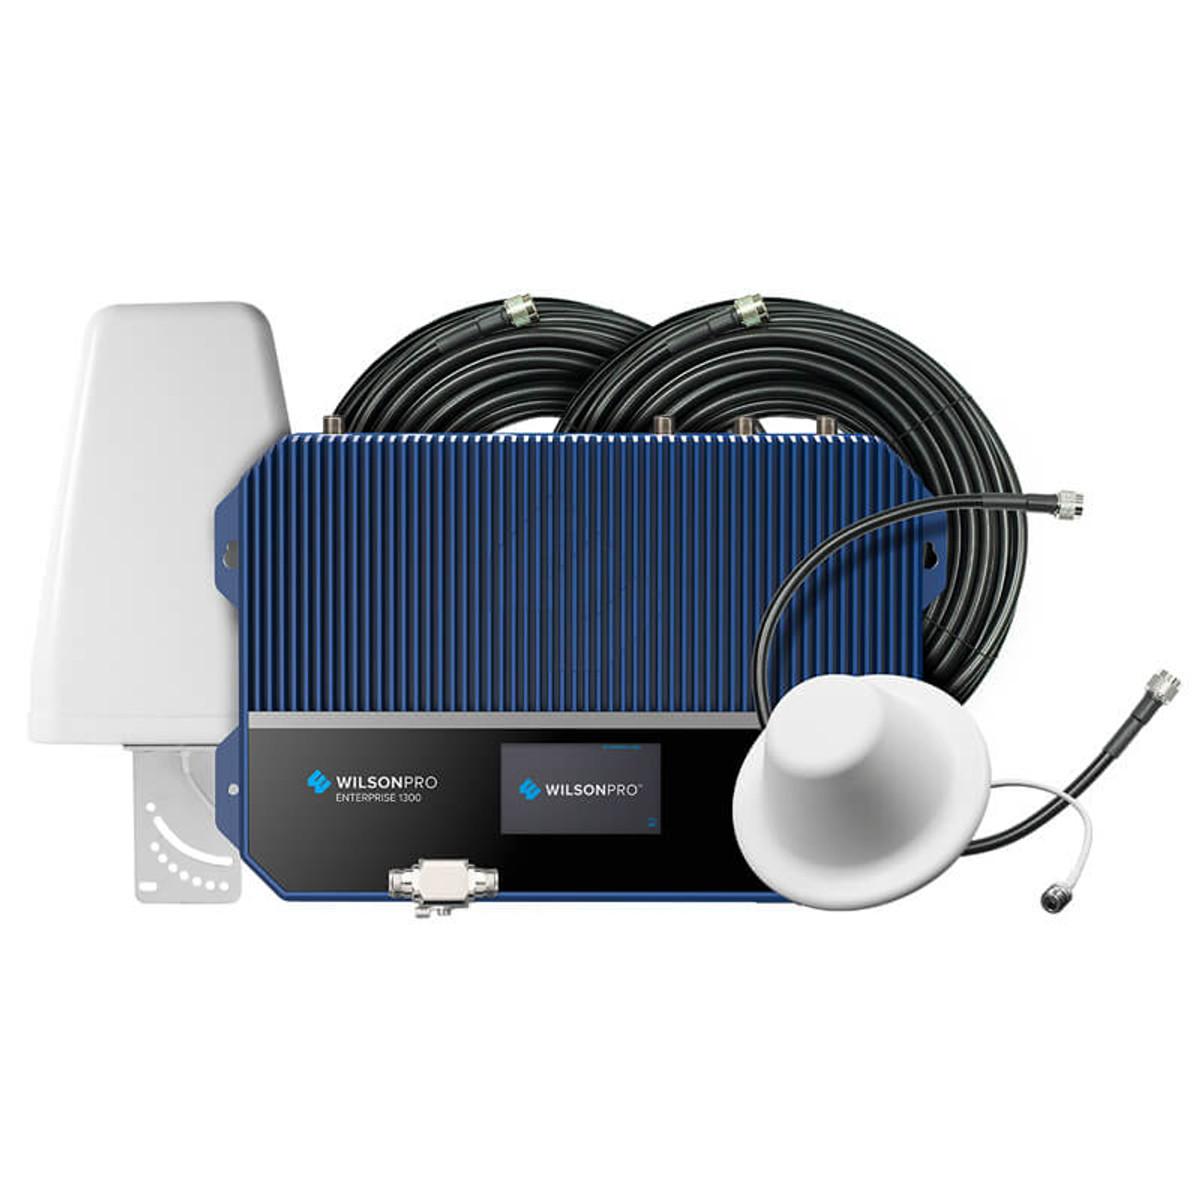 WilsonPro Enterprise 1300 Commercial Signal Booster Kit | 460149F